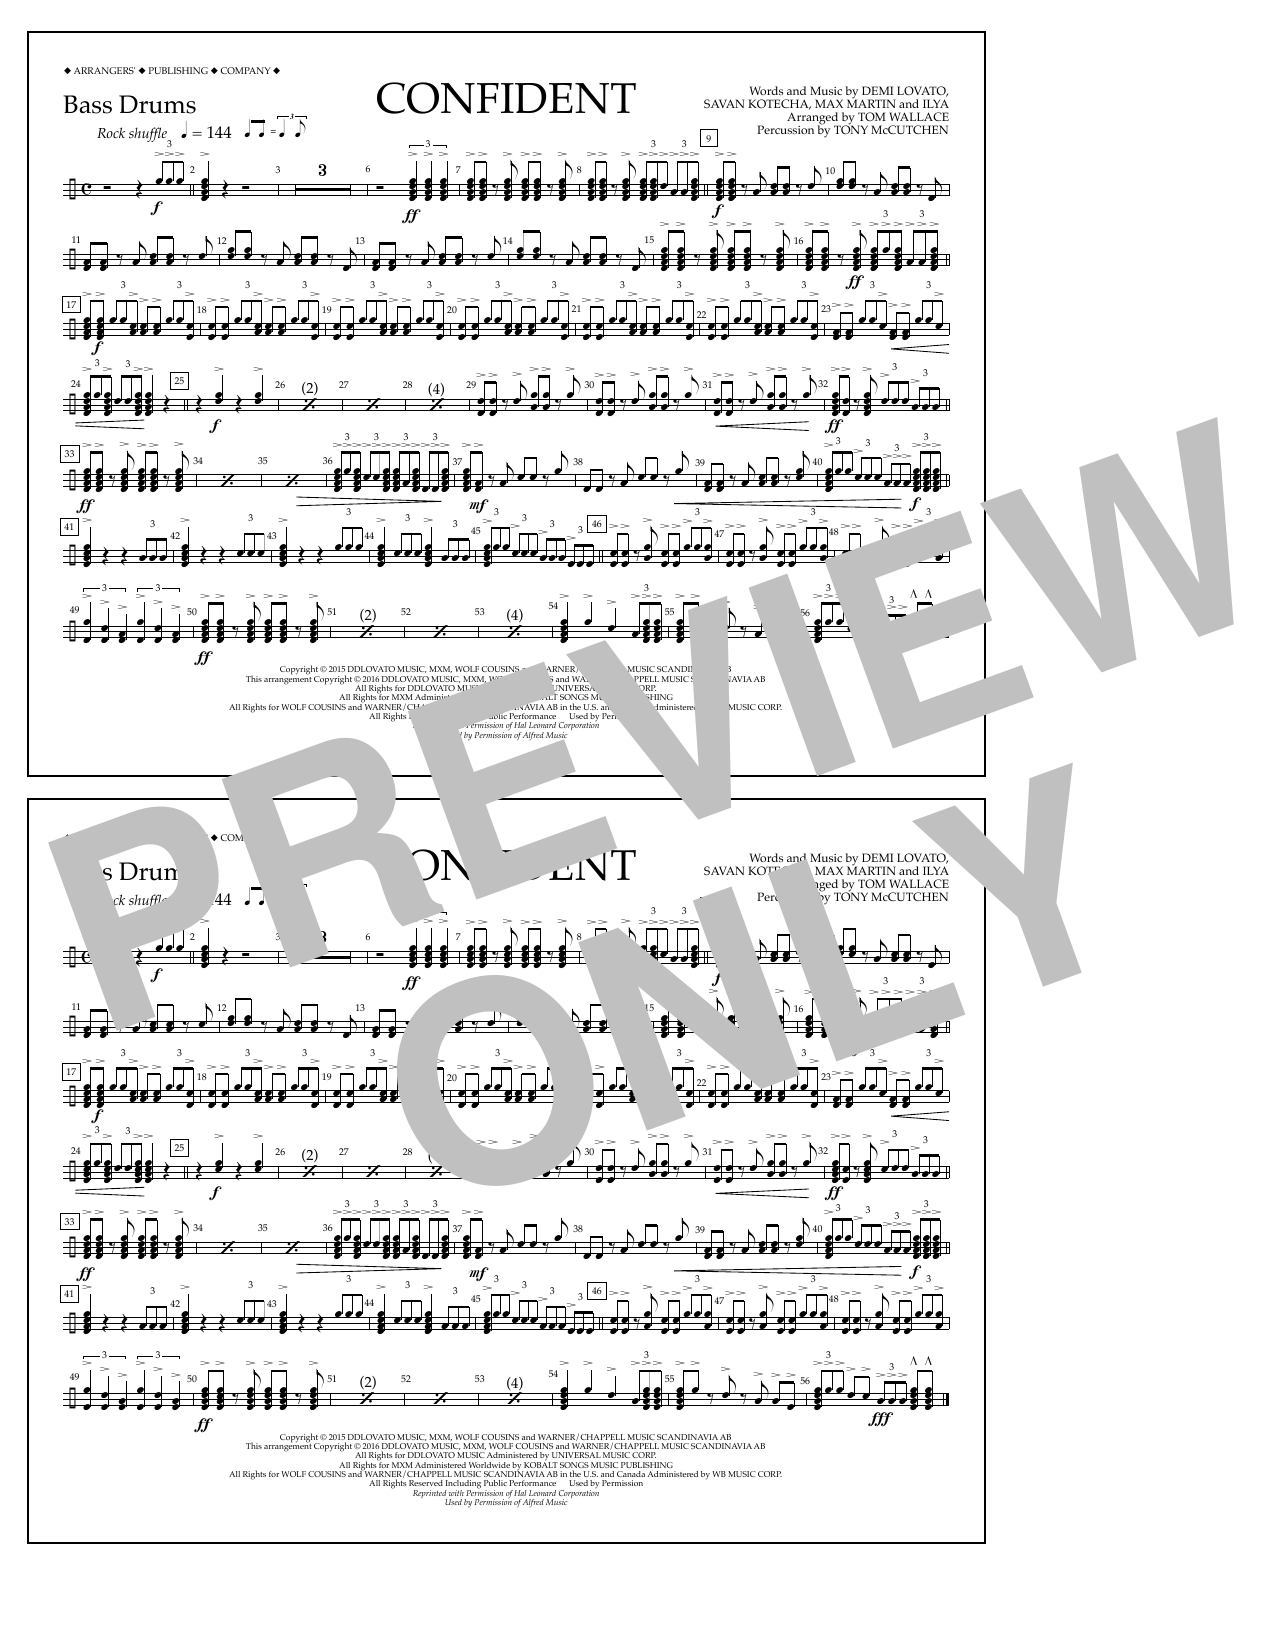 Sheet music digital files to print licensed demi lovato digital confident bass drums hexwebz Gallery